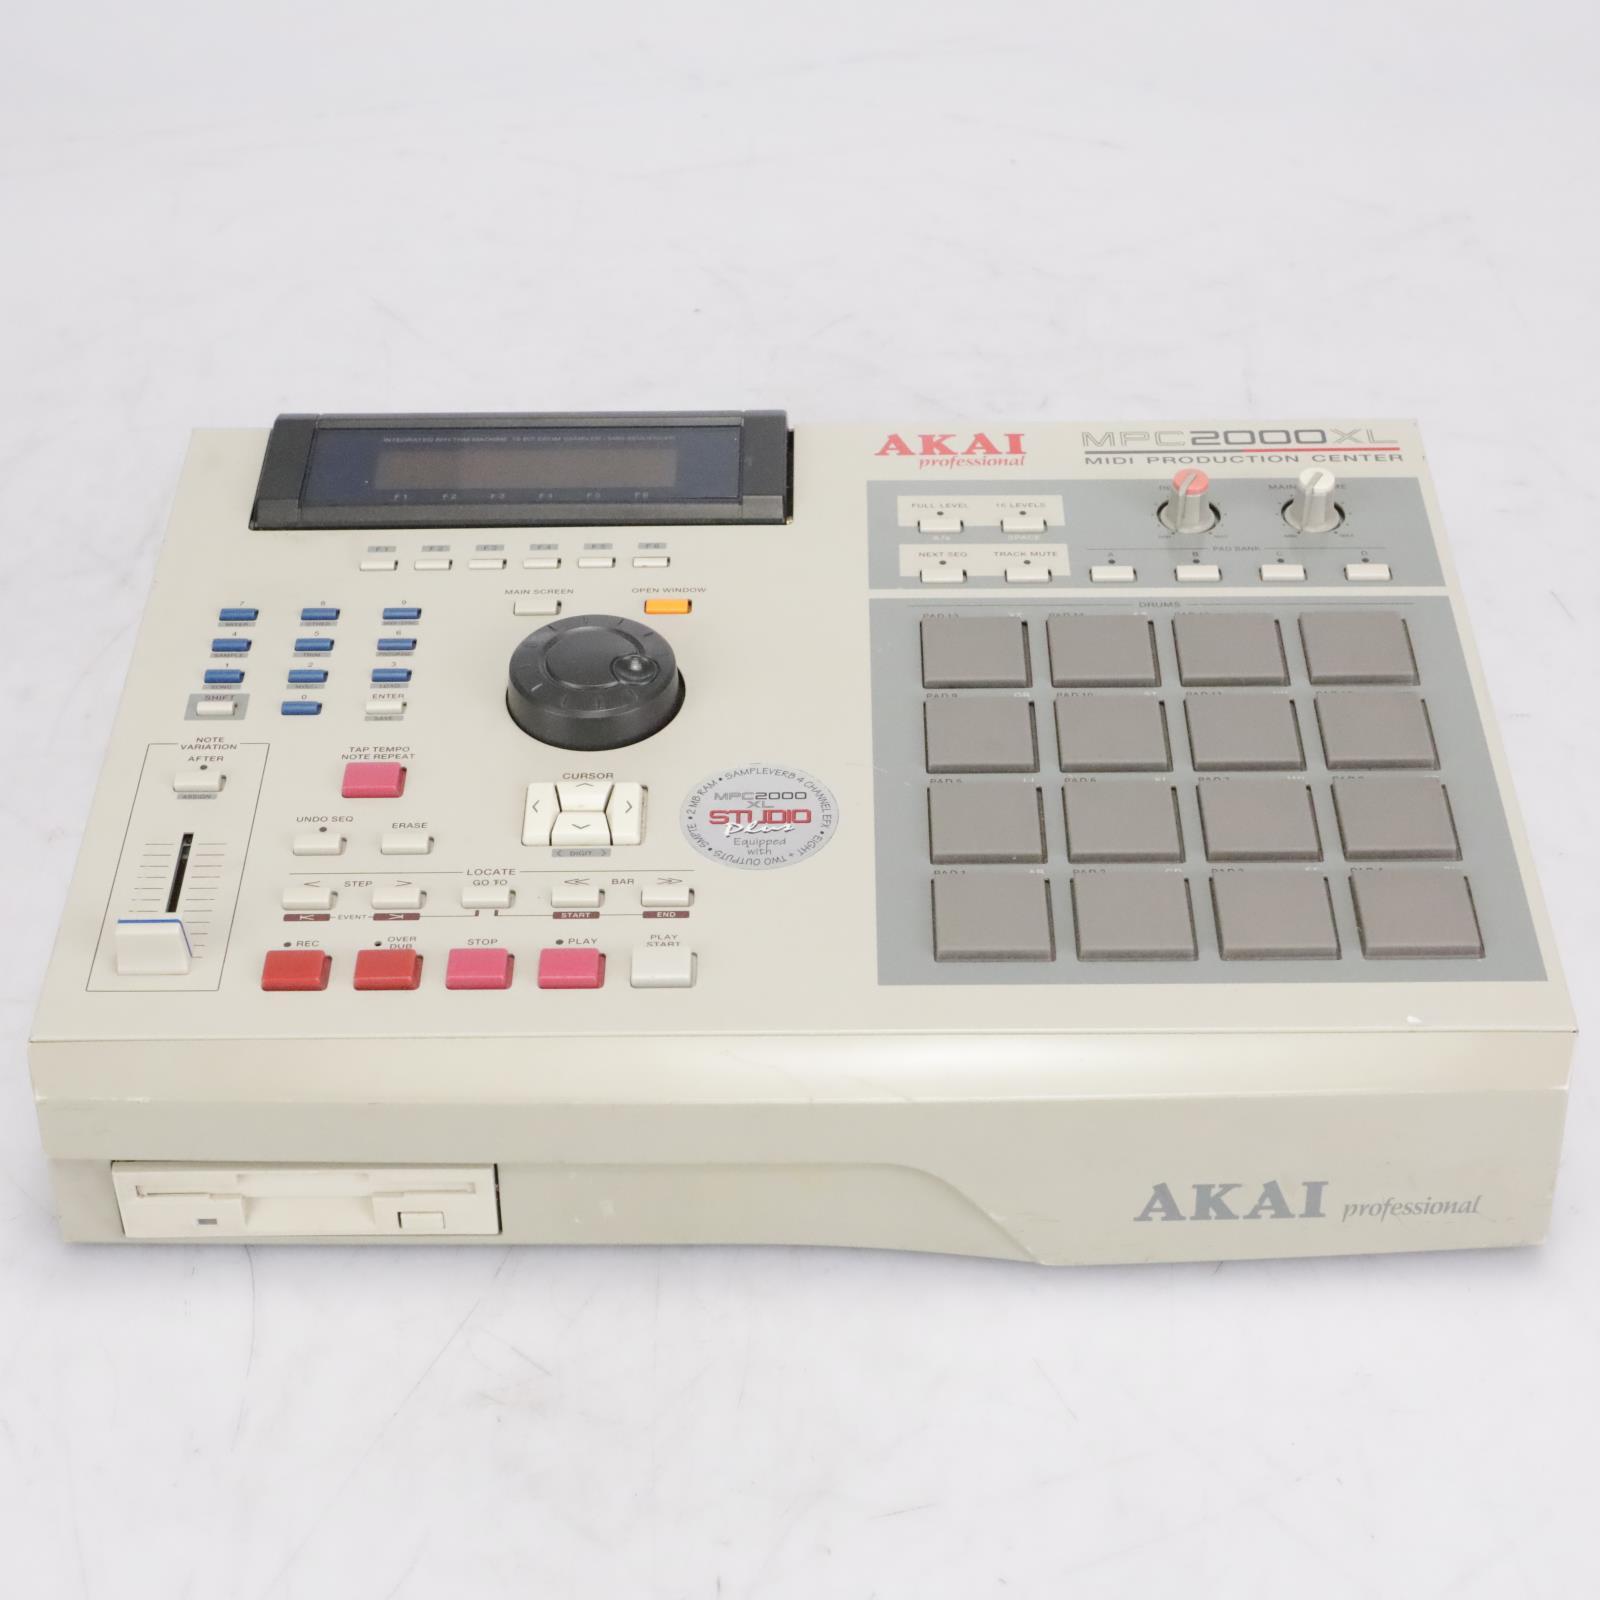 AKAI MPC2000XL Studio Plus MIDI Production Center Sampler Sequencer #42671